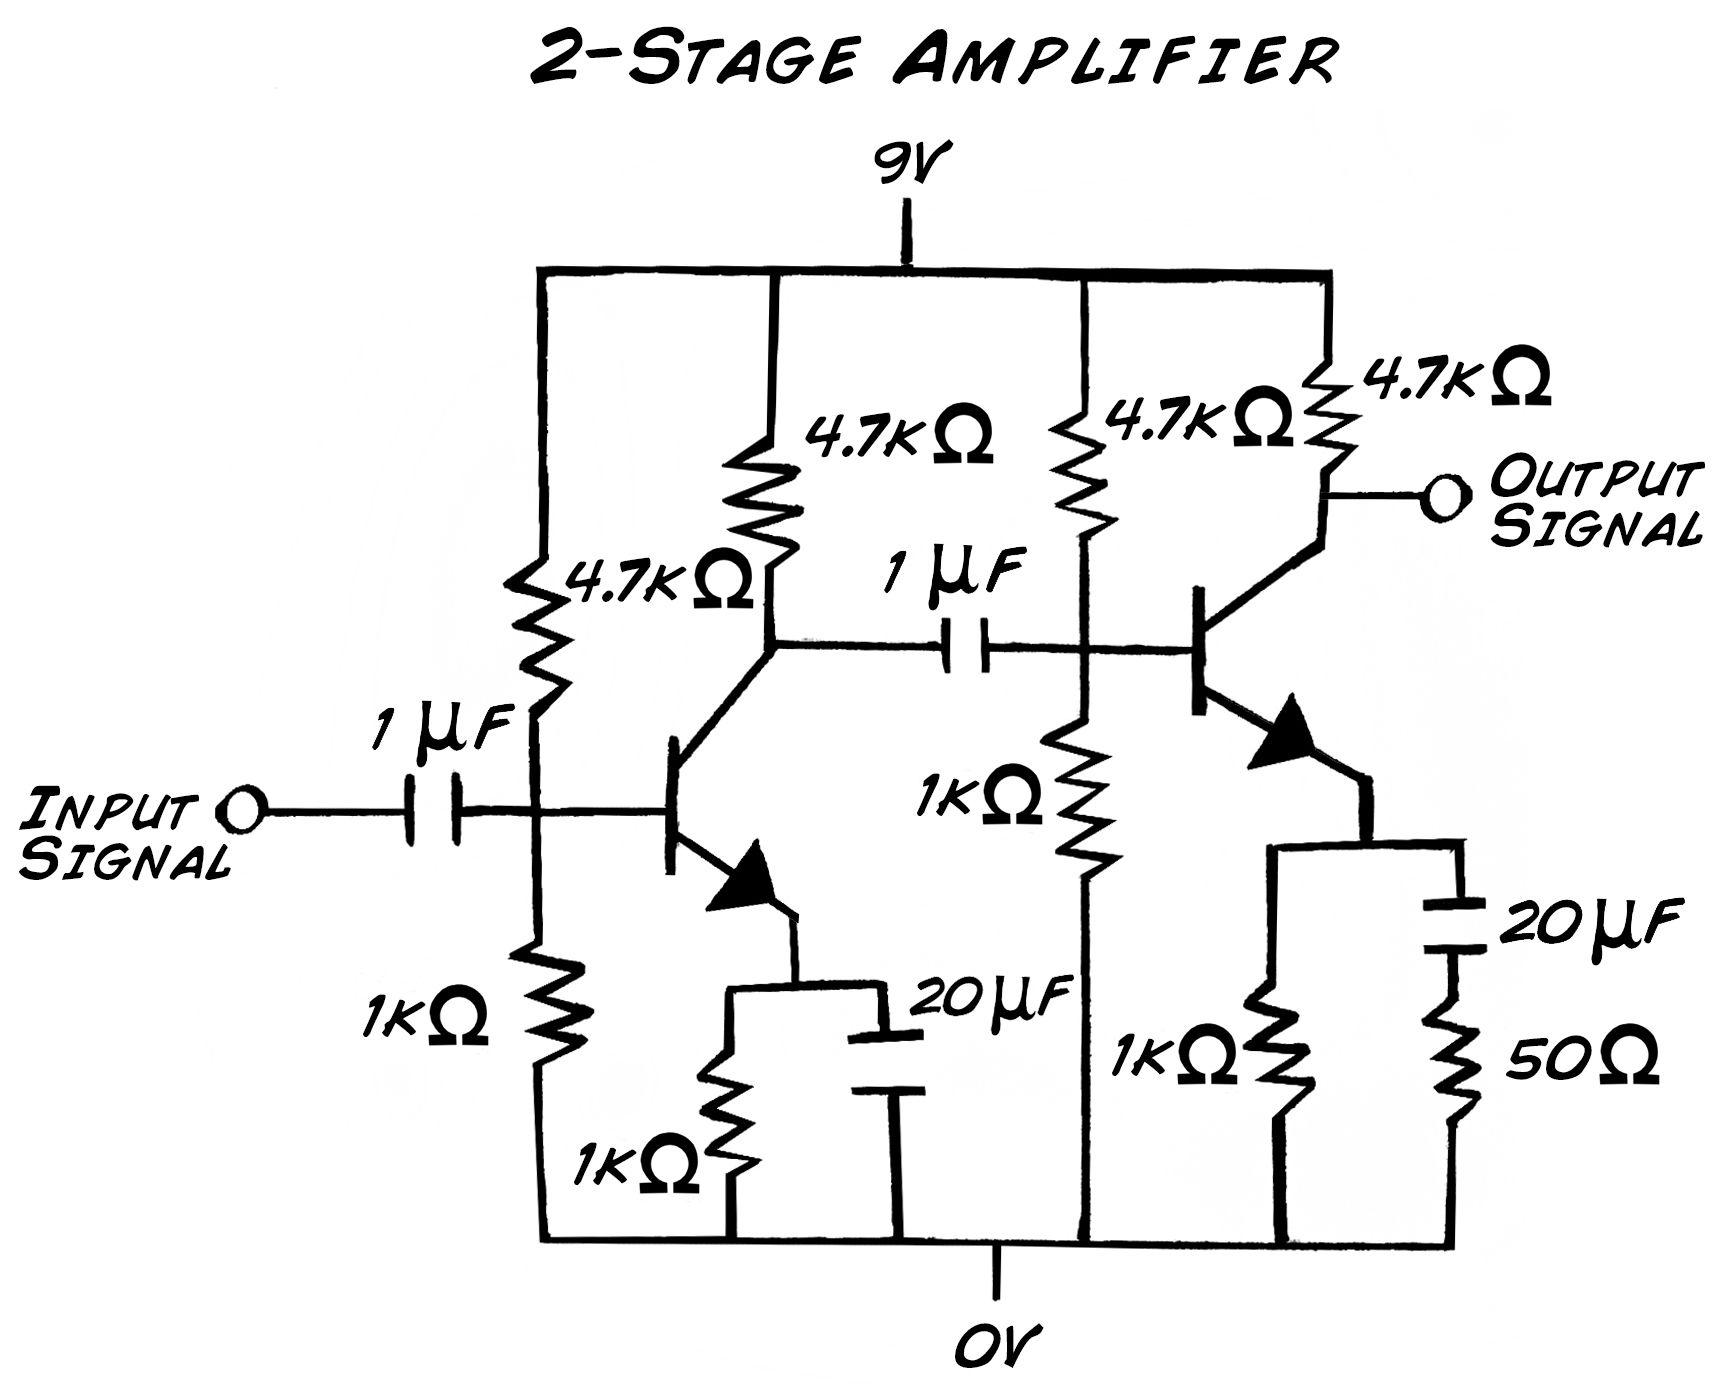 transistor amplifier design software